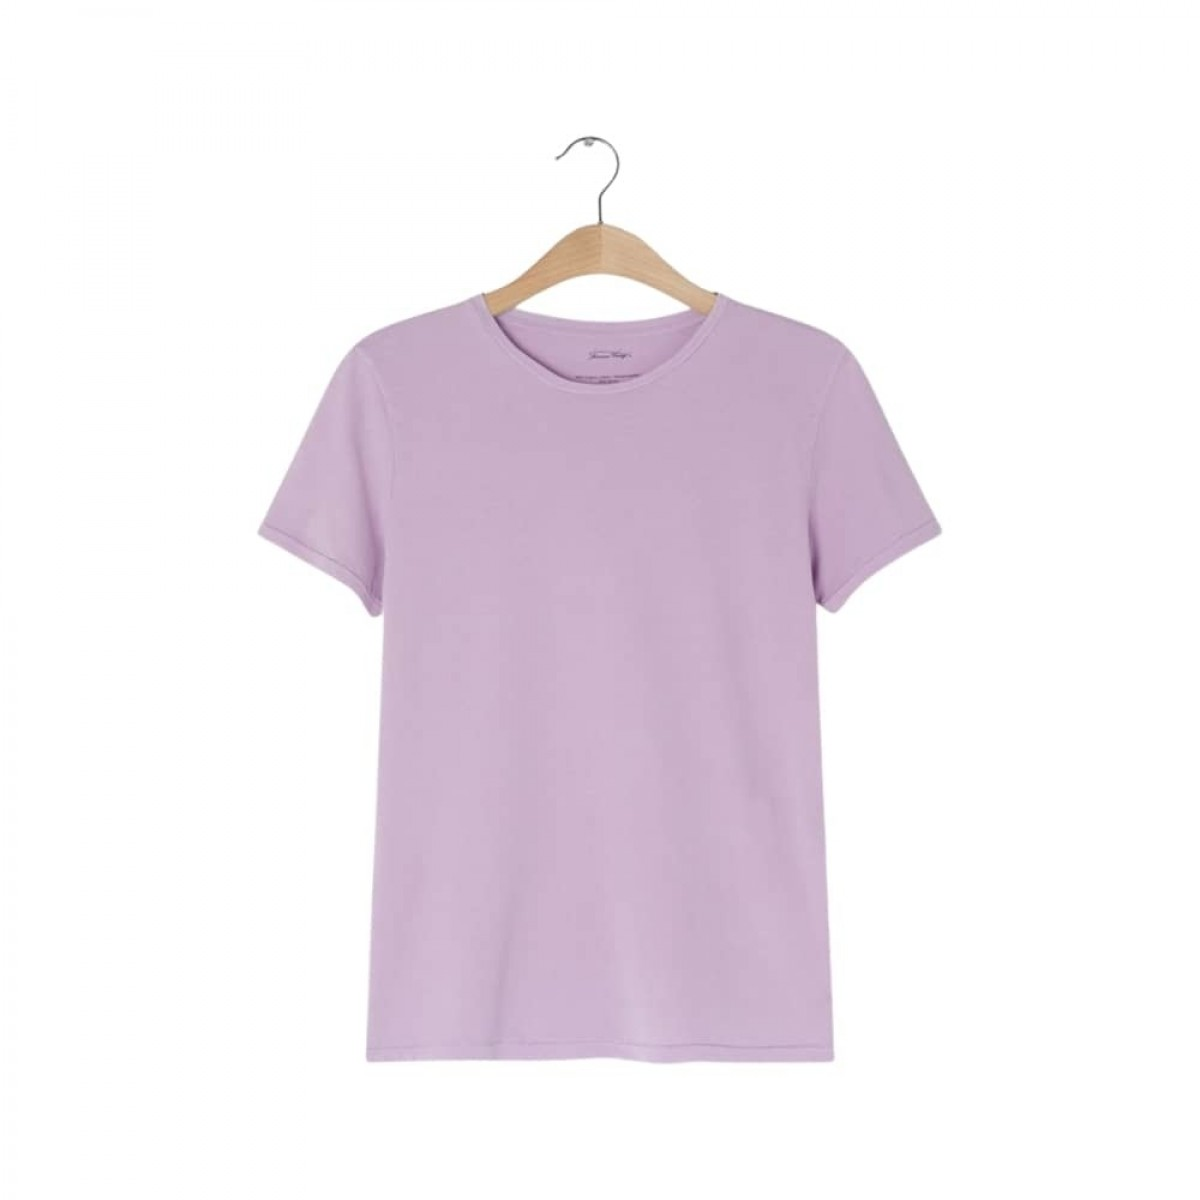 vegiflower t-shirt - soft violet